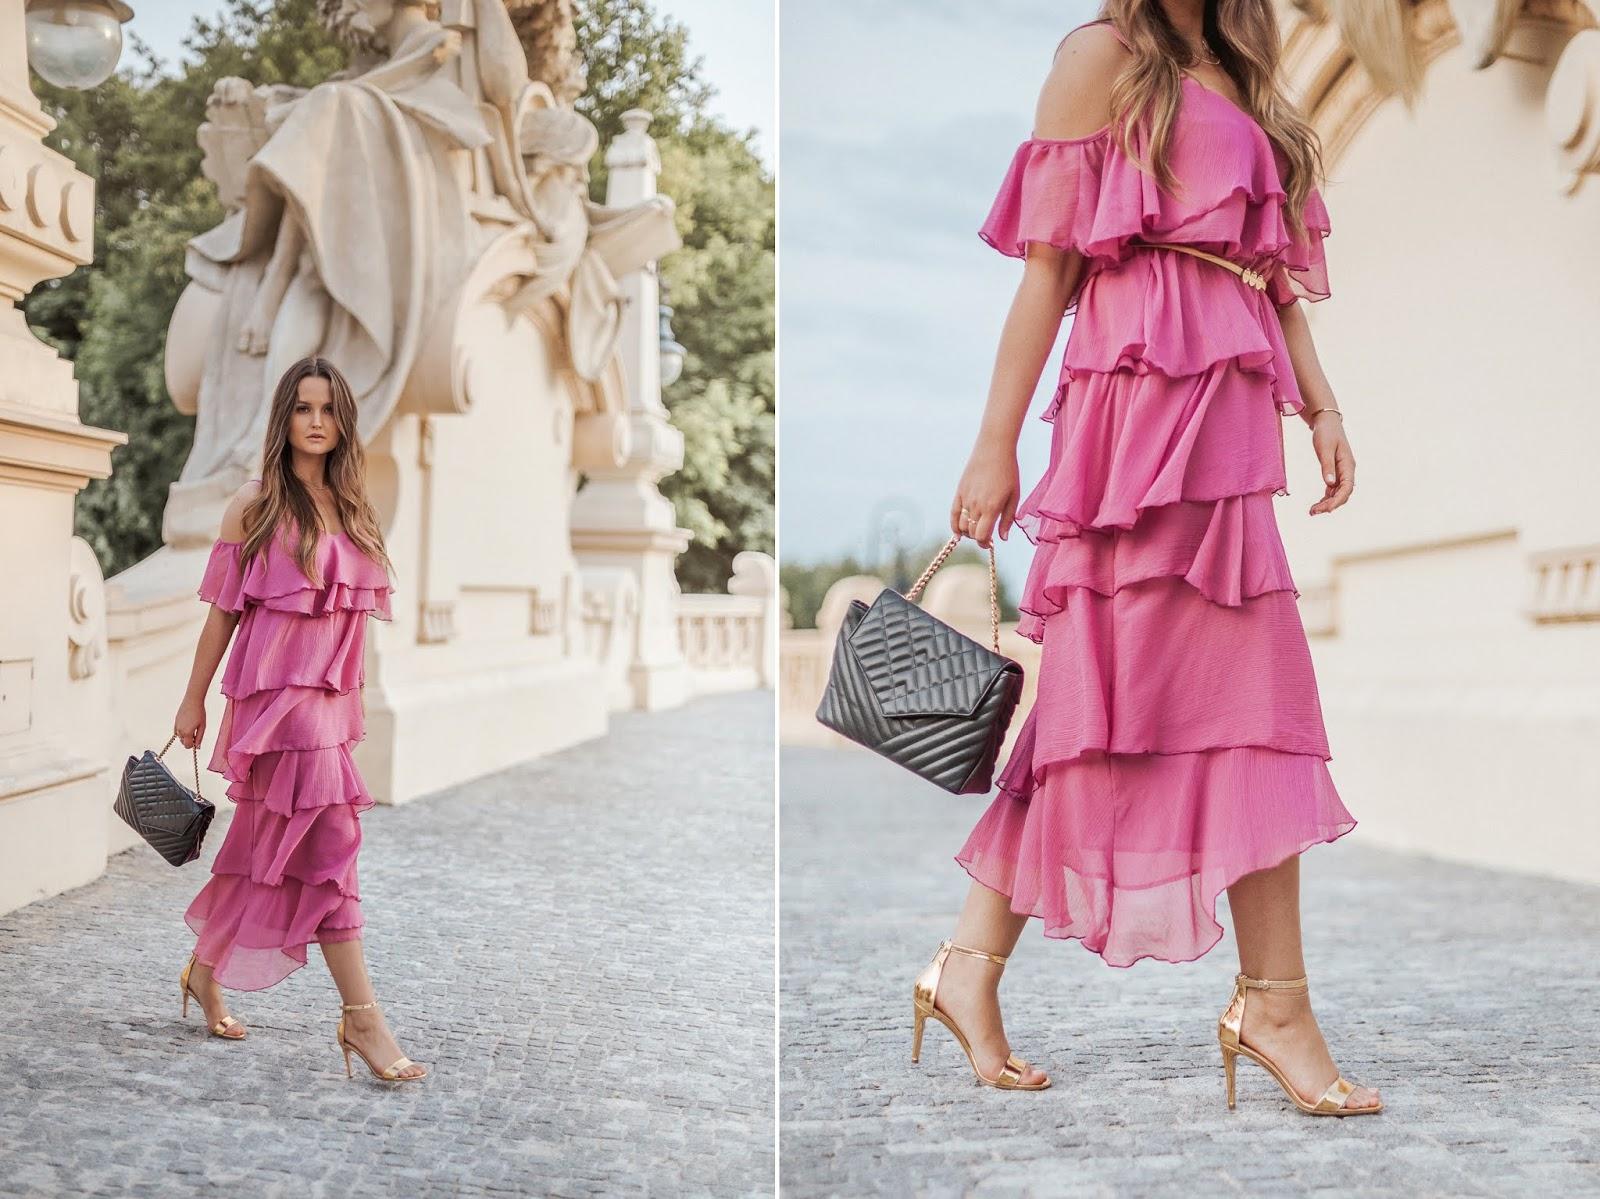 1bdae4a3 Różowa sukienka na wesele- jakie buty?